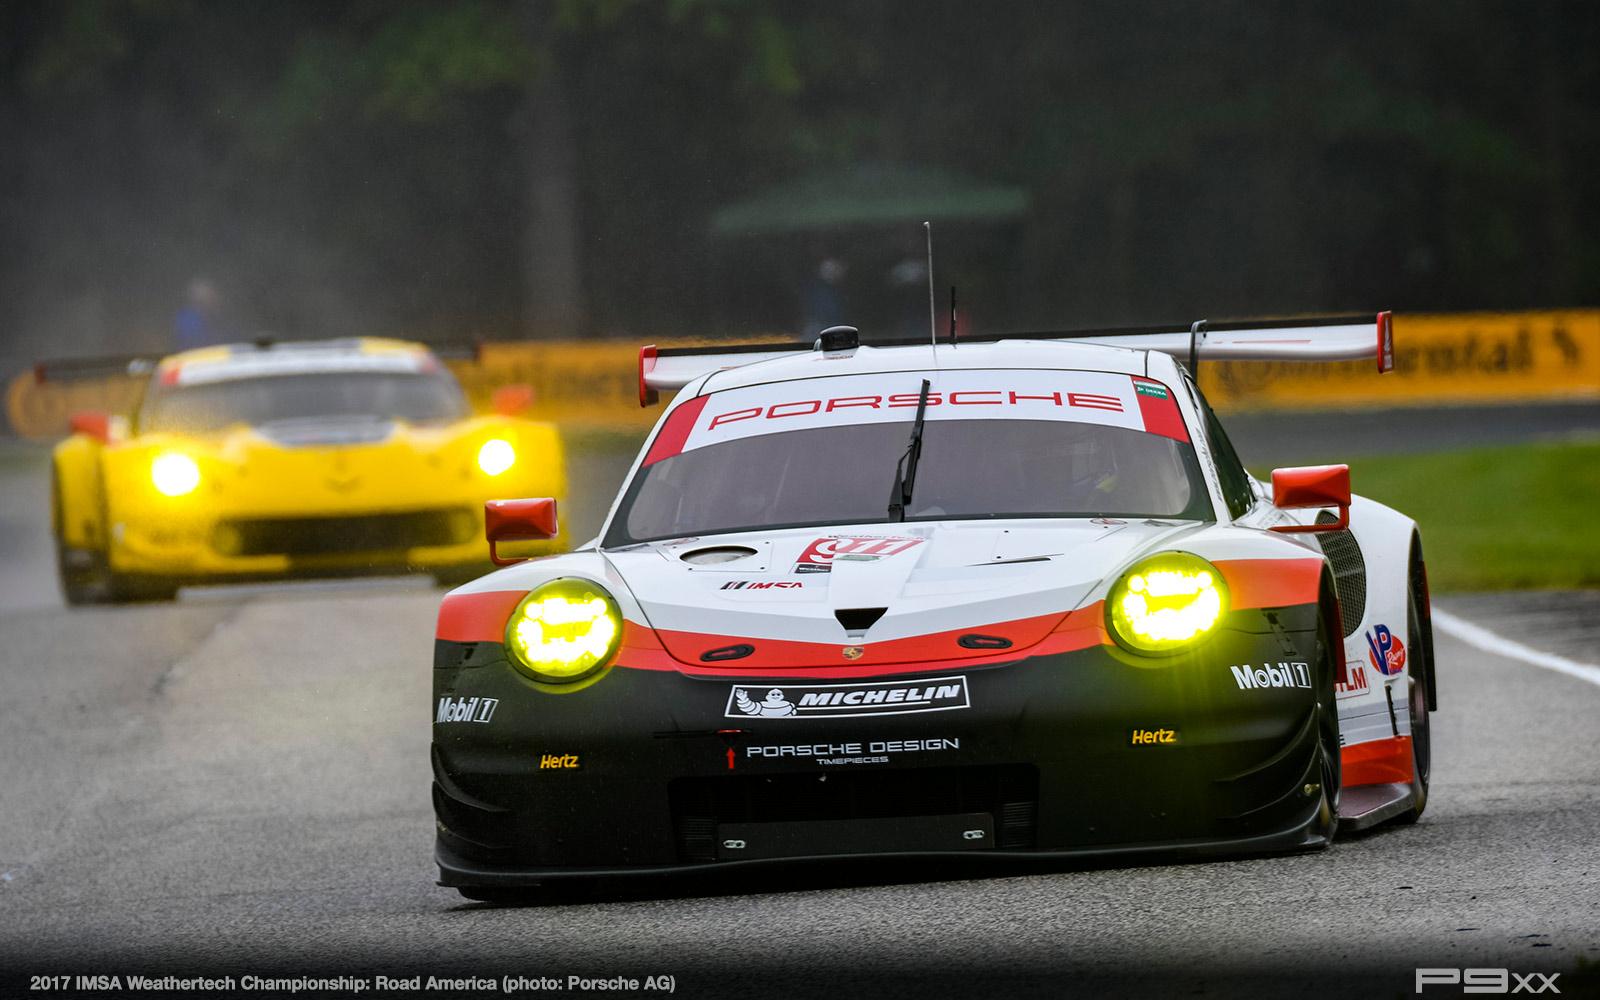 2017-IMSA-Weathertech-Road-America-Porsche-296